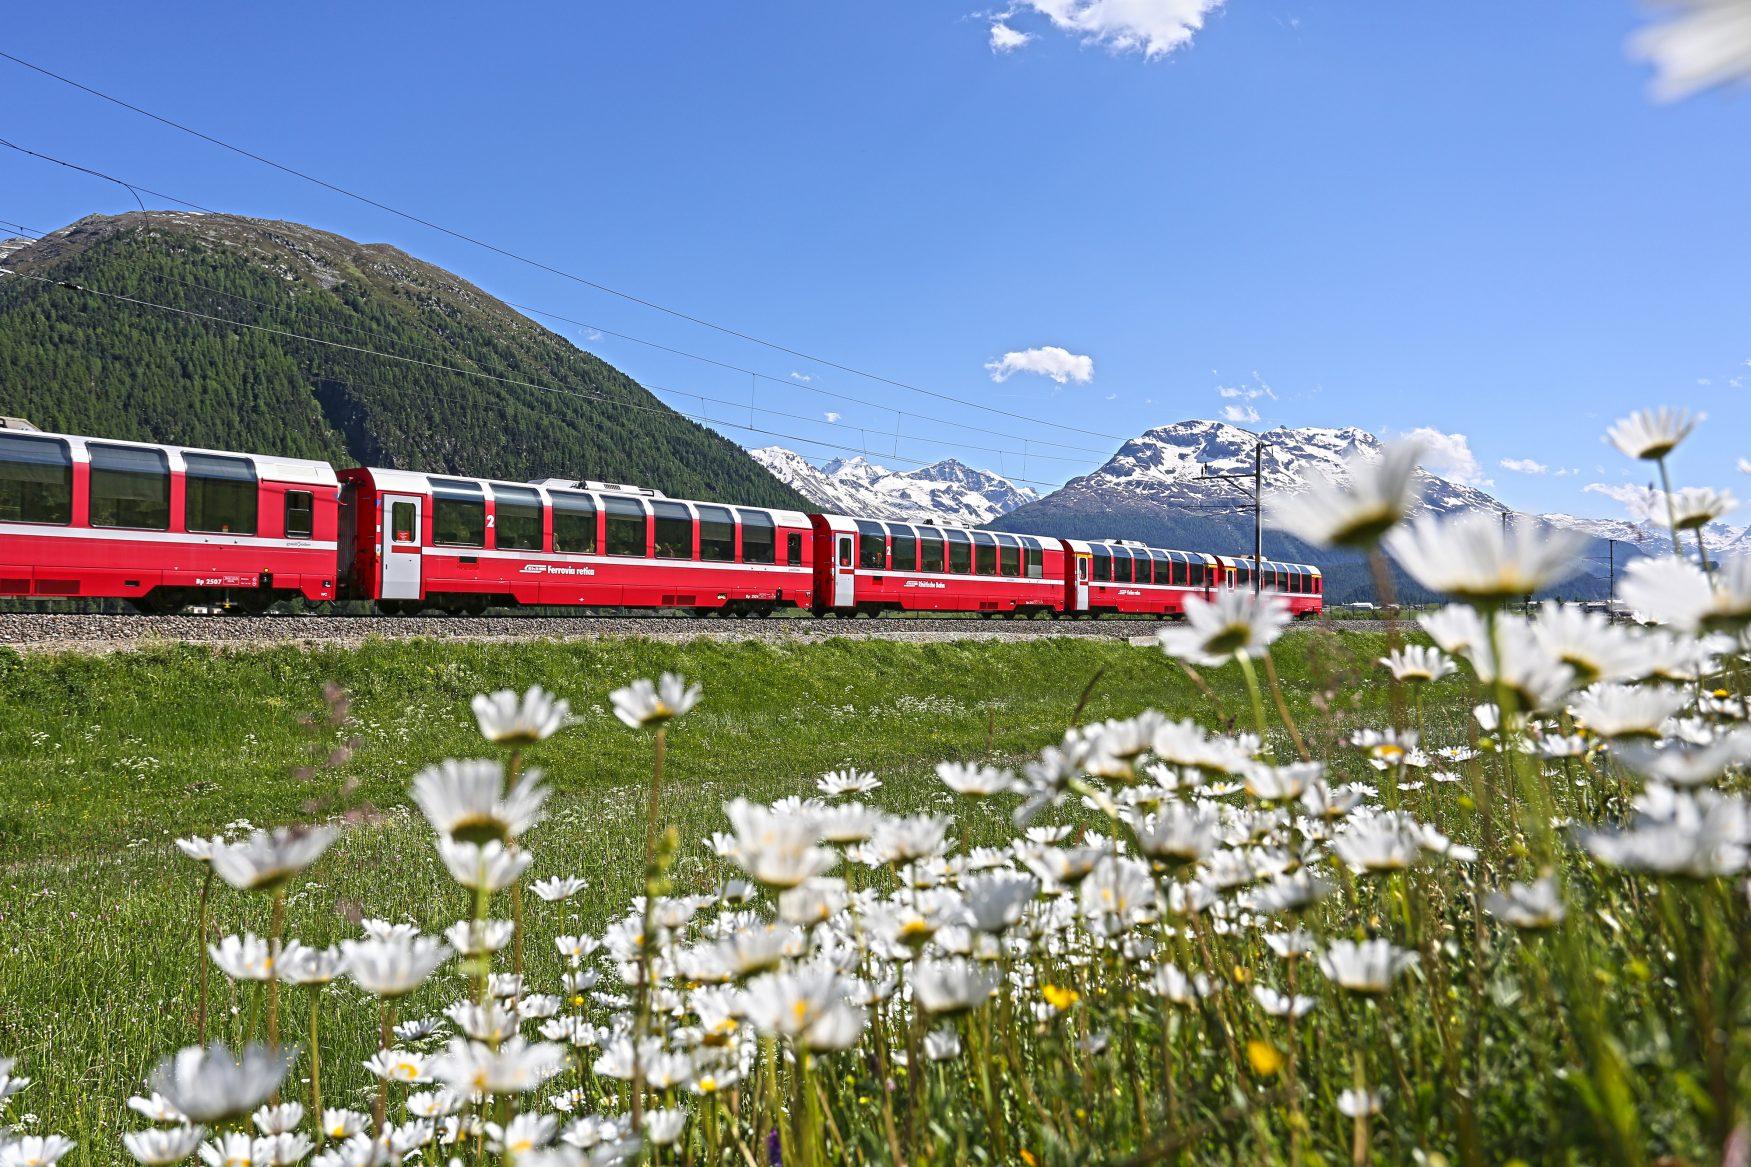 Kräuterexpresse, Foto: Bernina Kräuter Express/Rhätische Bahn